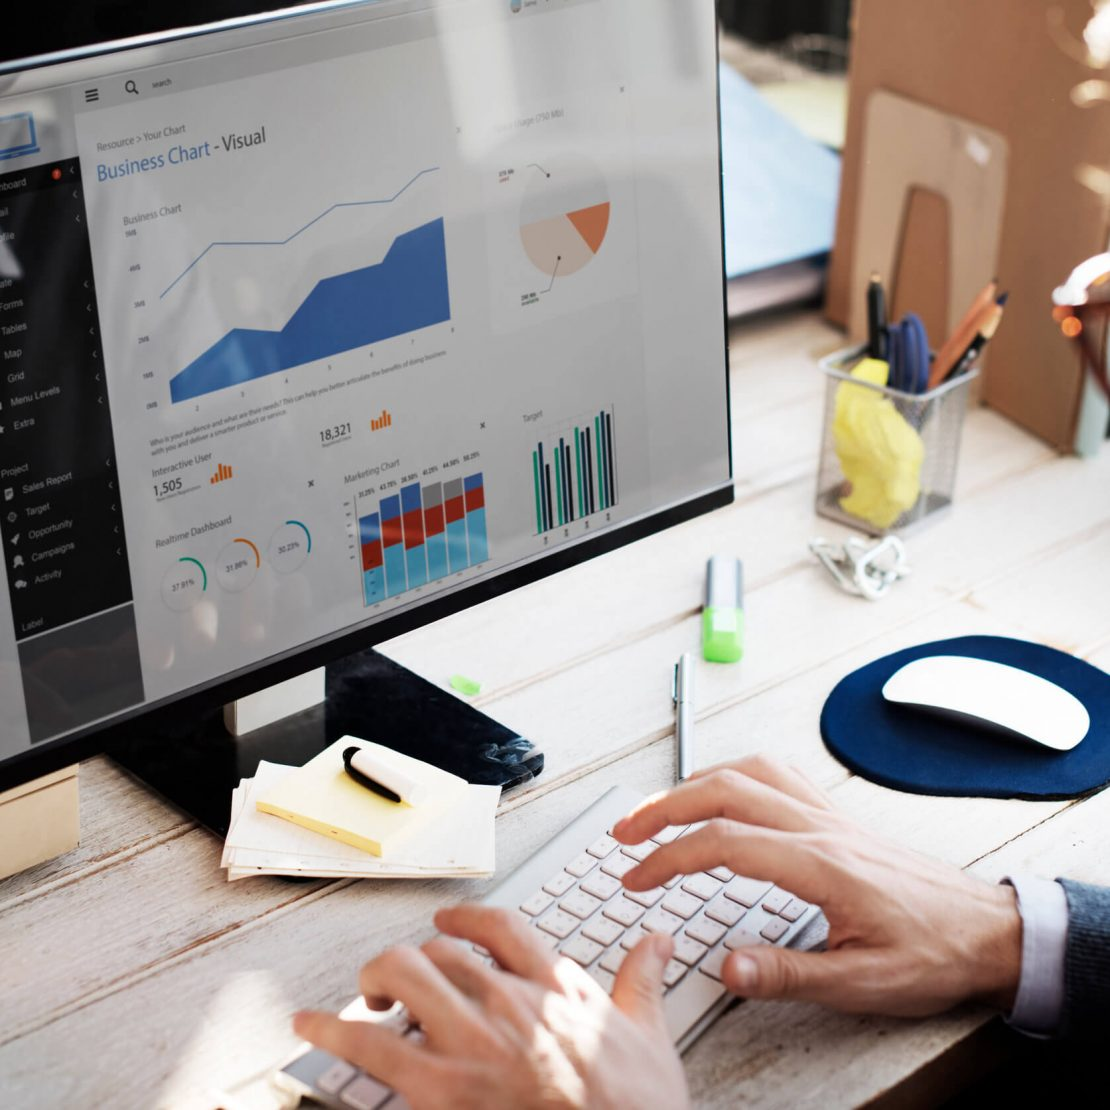 Report building, Dashboards & Analytics